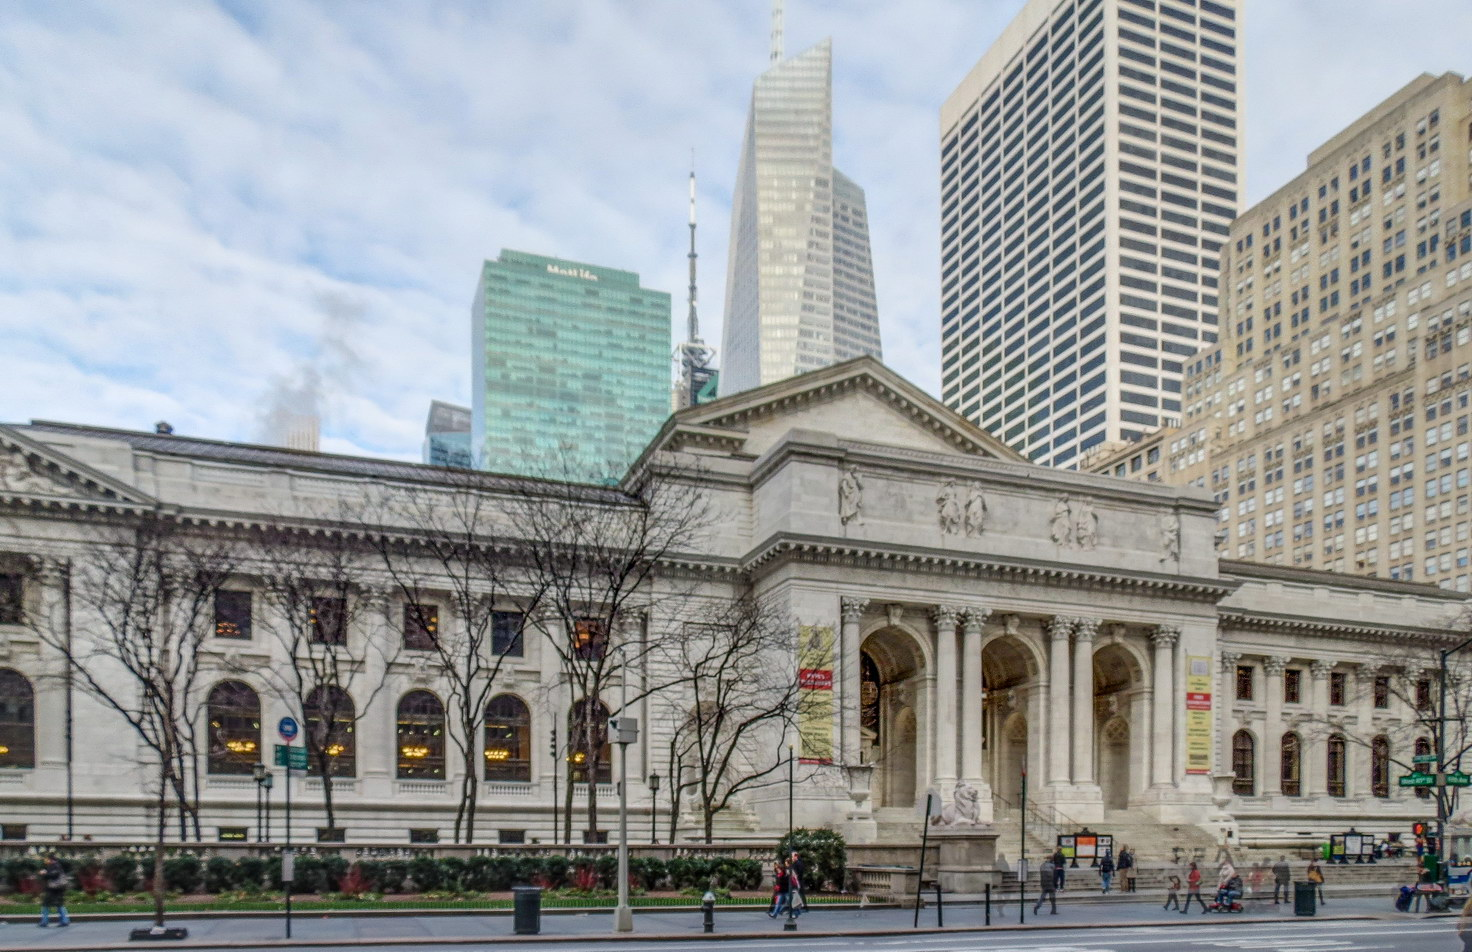 New York Public Library - Fifth Avenue, W 40 - W 42 St.